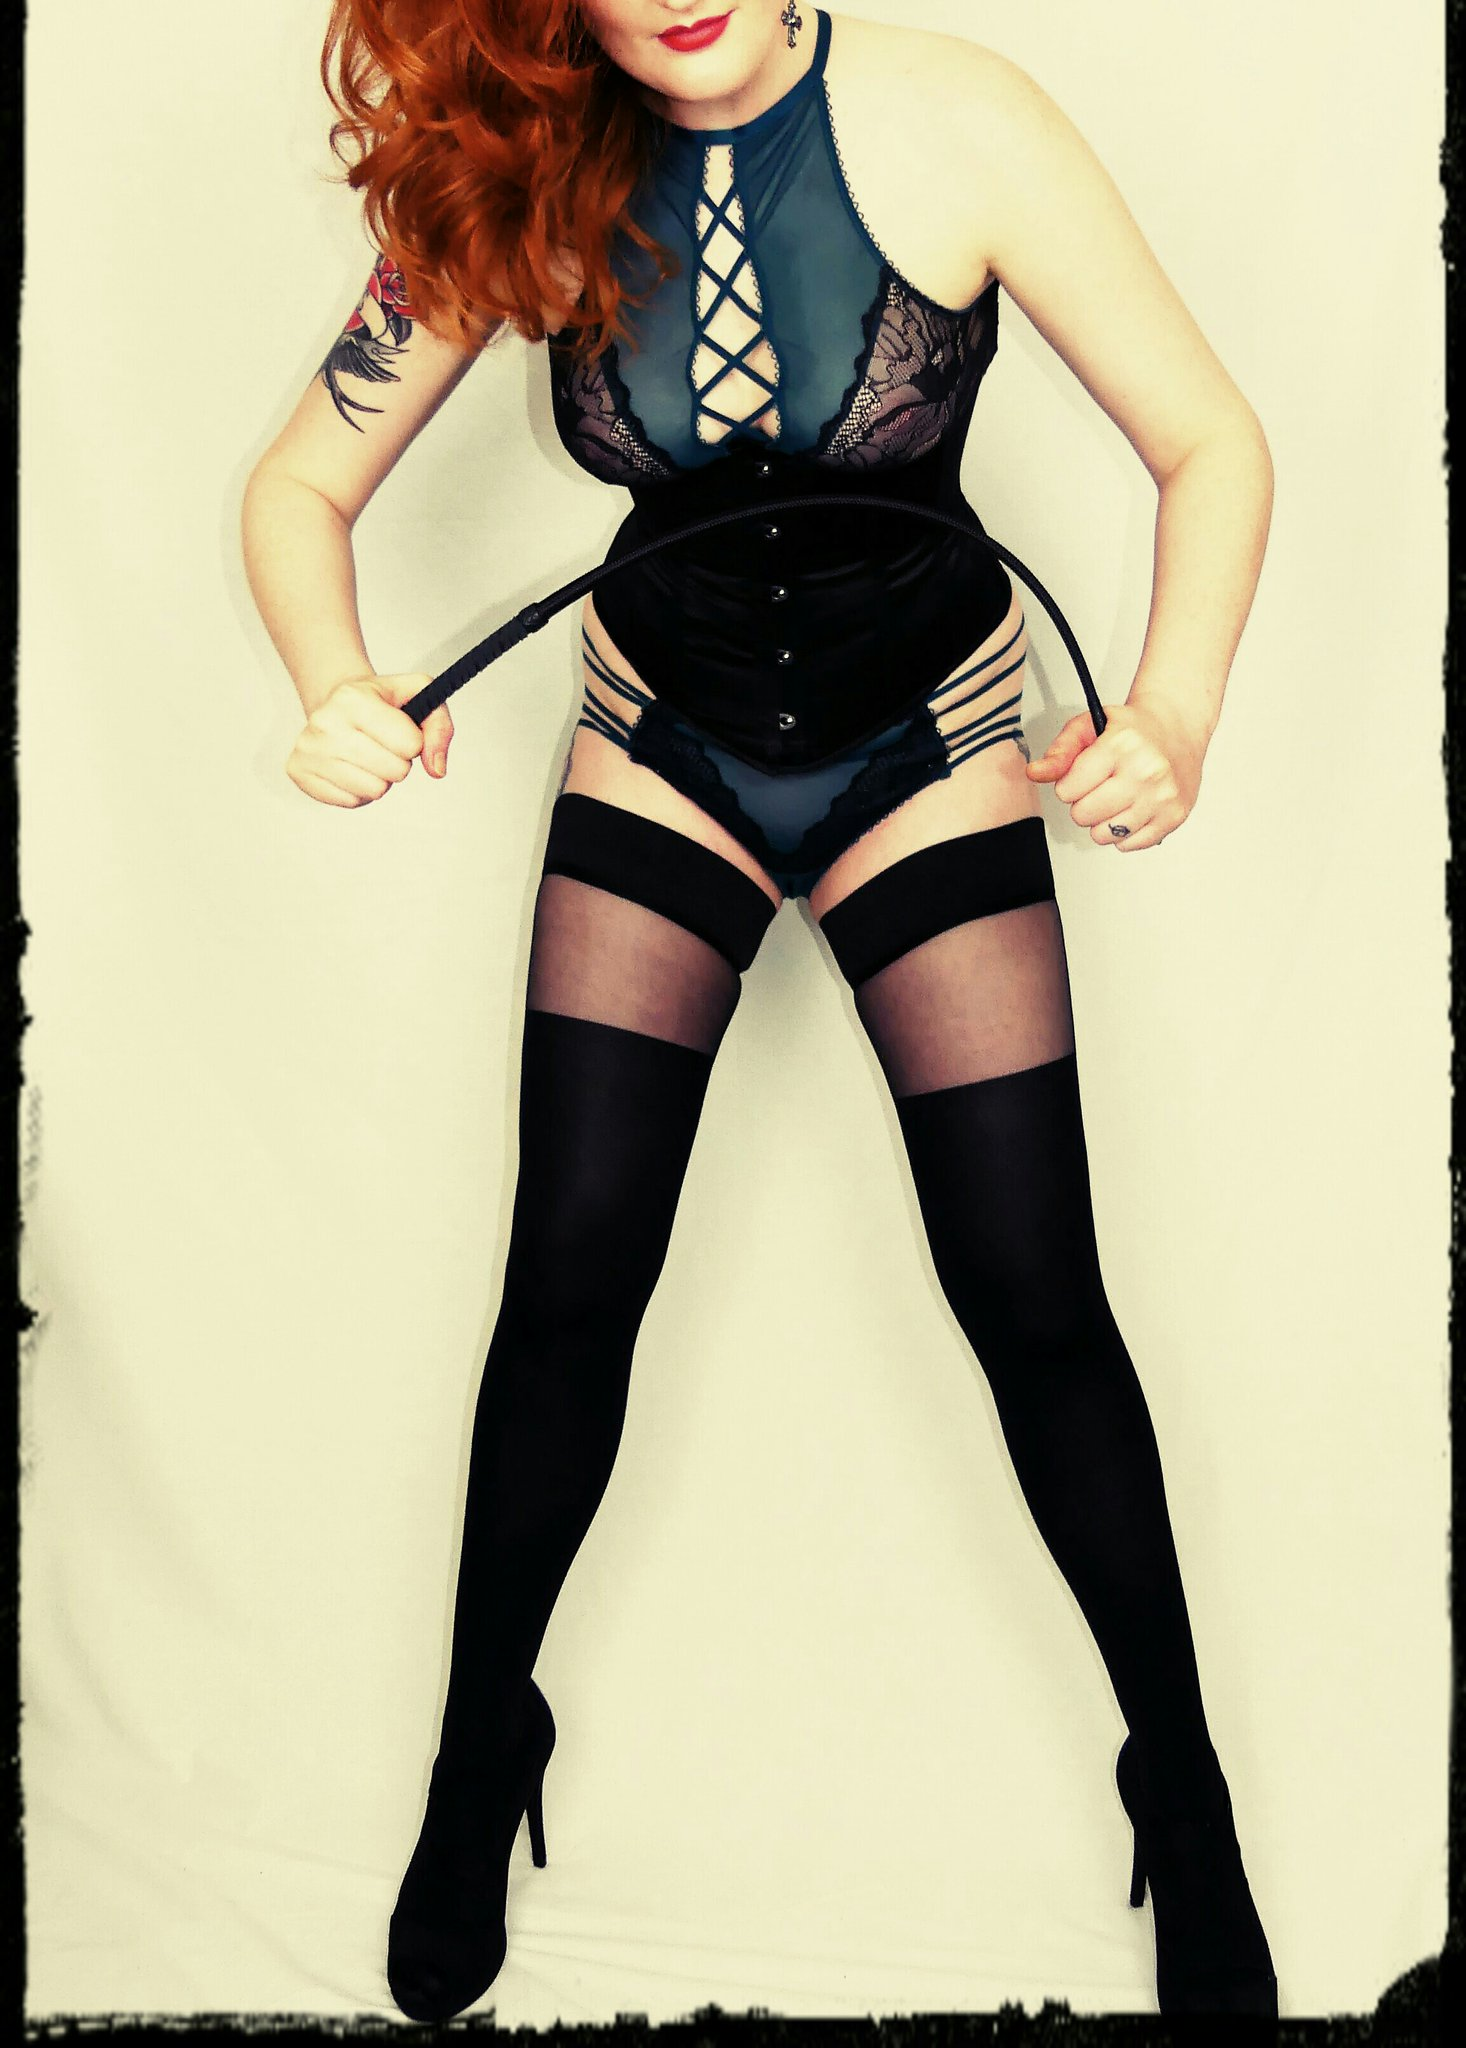 Mistress Nicole